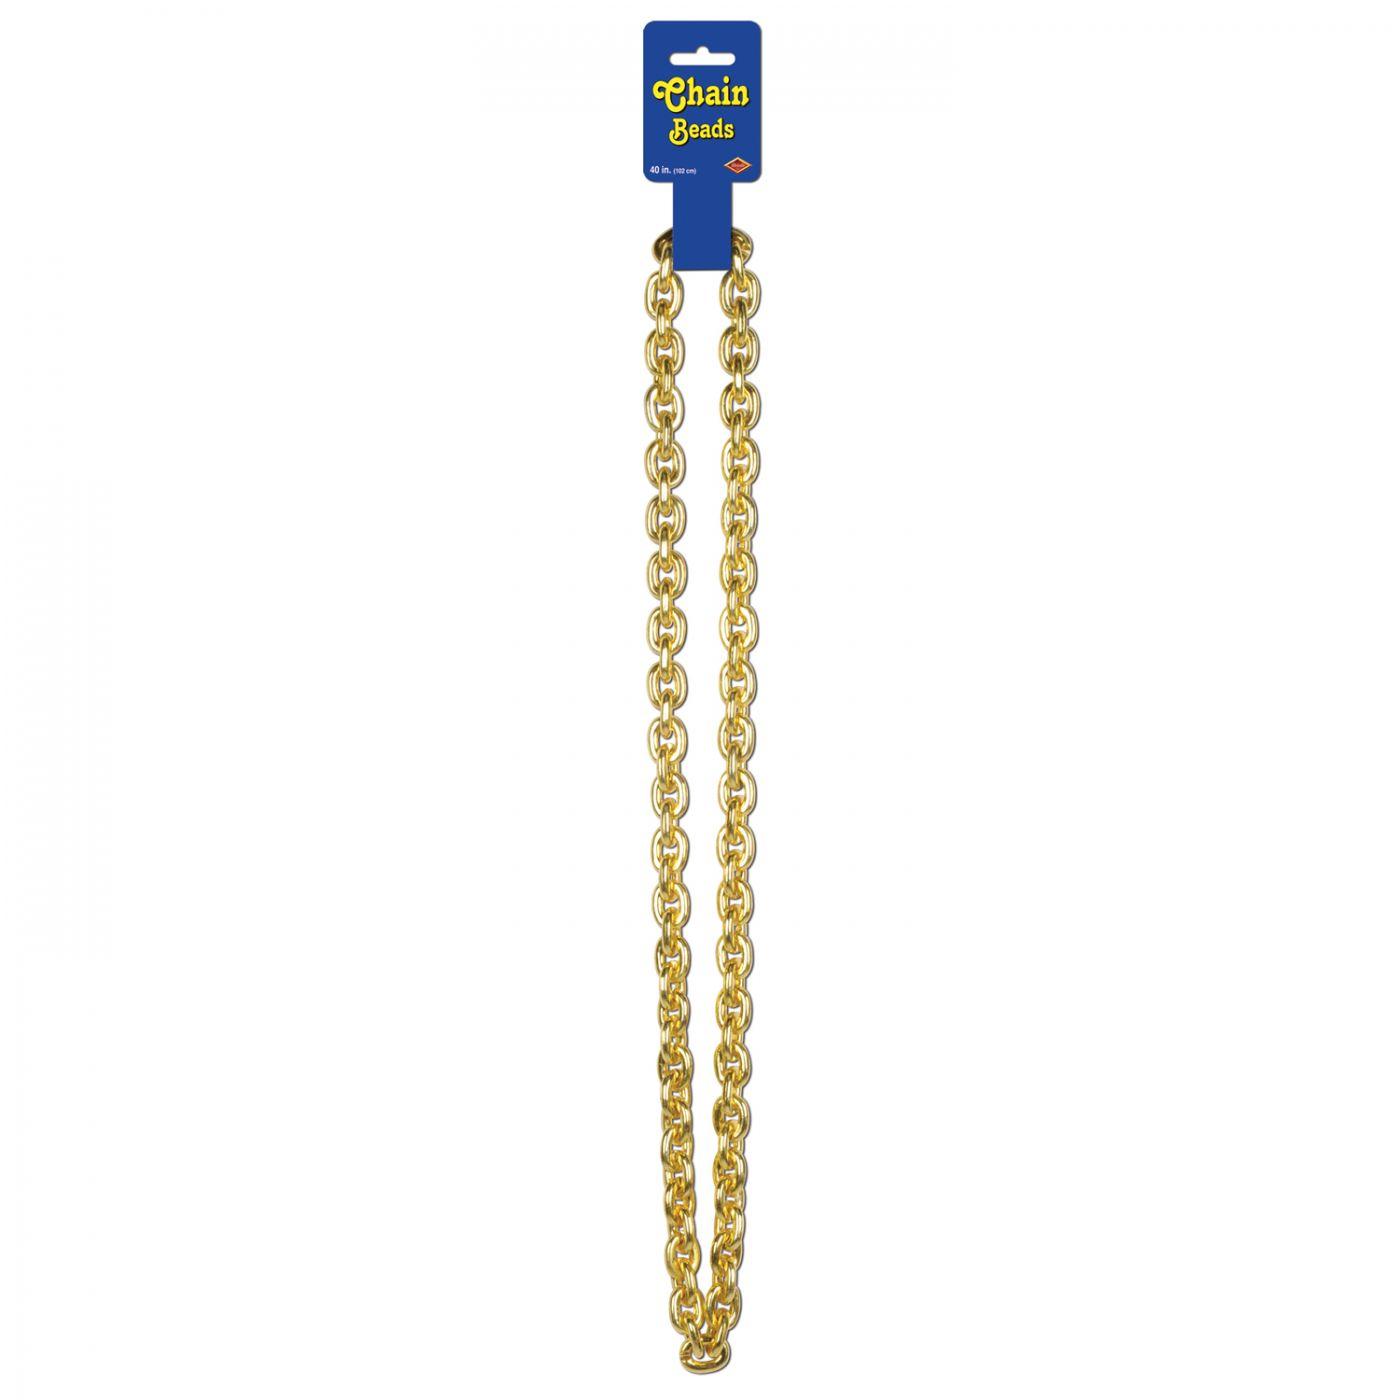 Chain Beads image